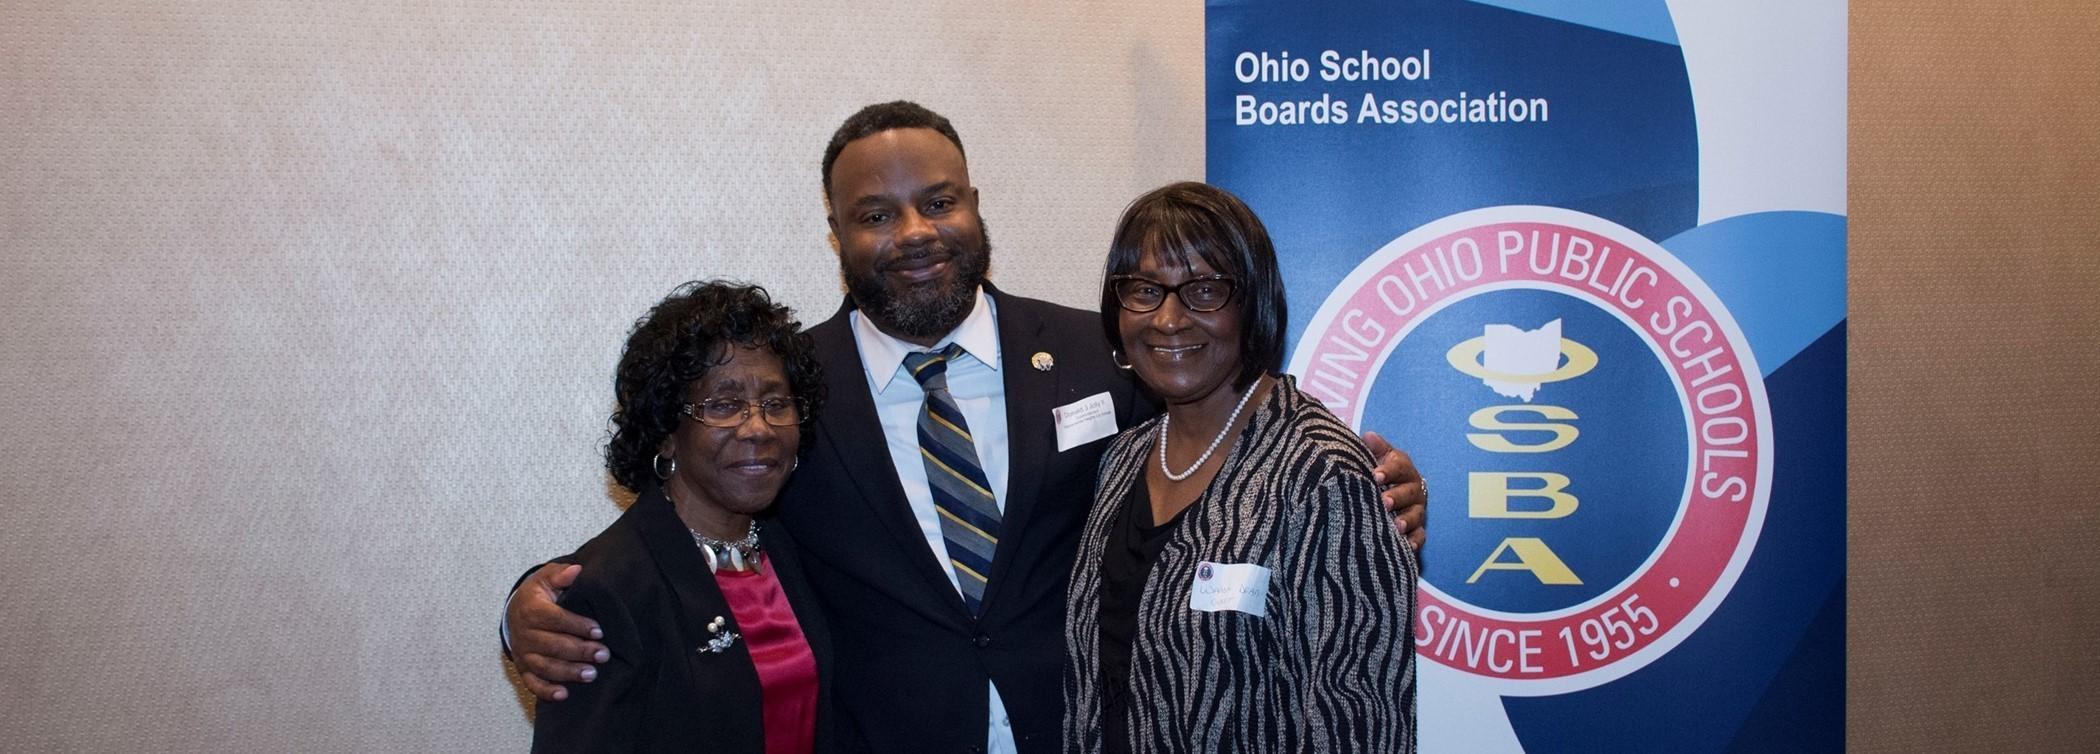 Mrs. Fannie Dean wins OSBA Award